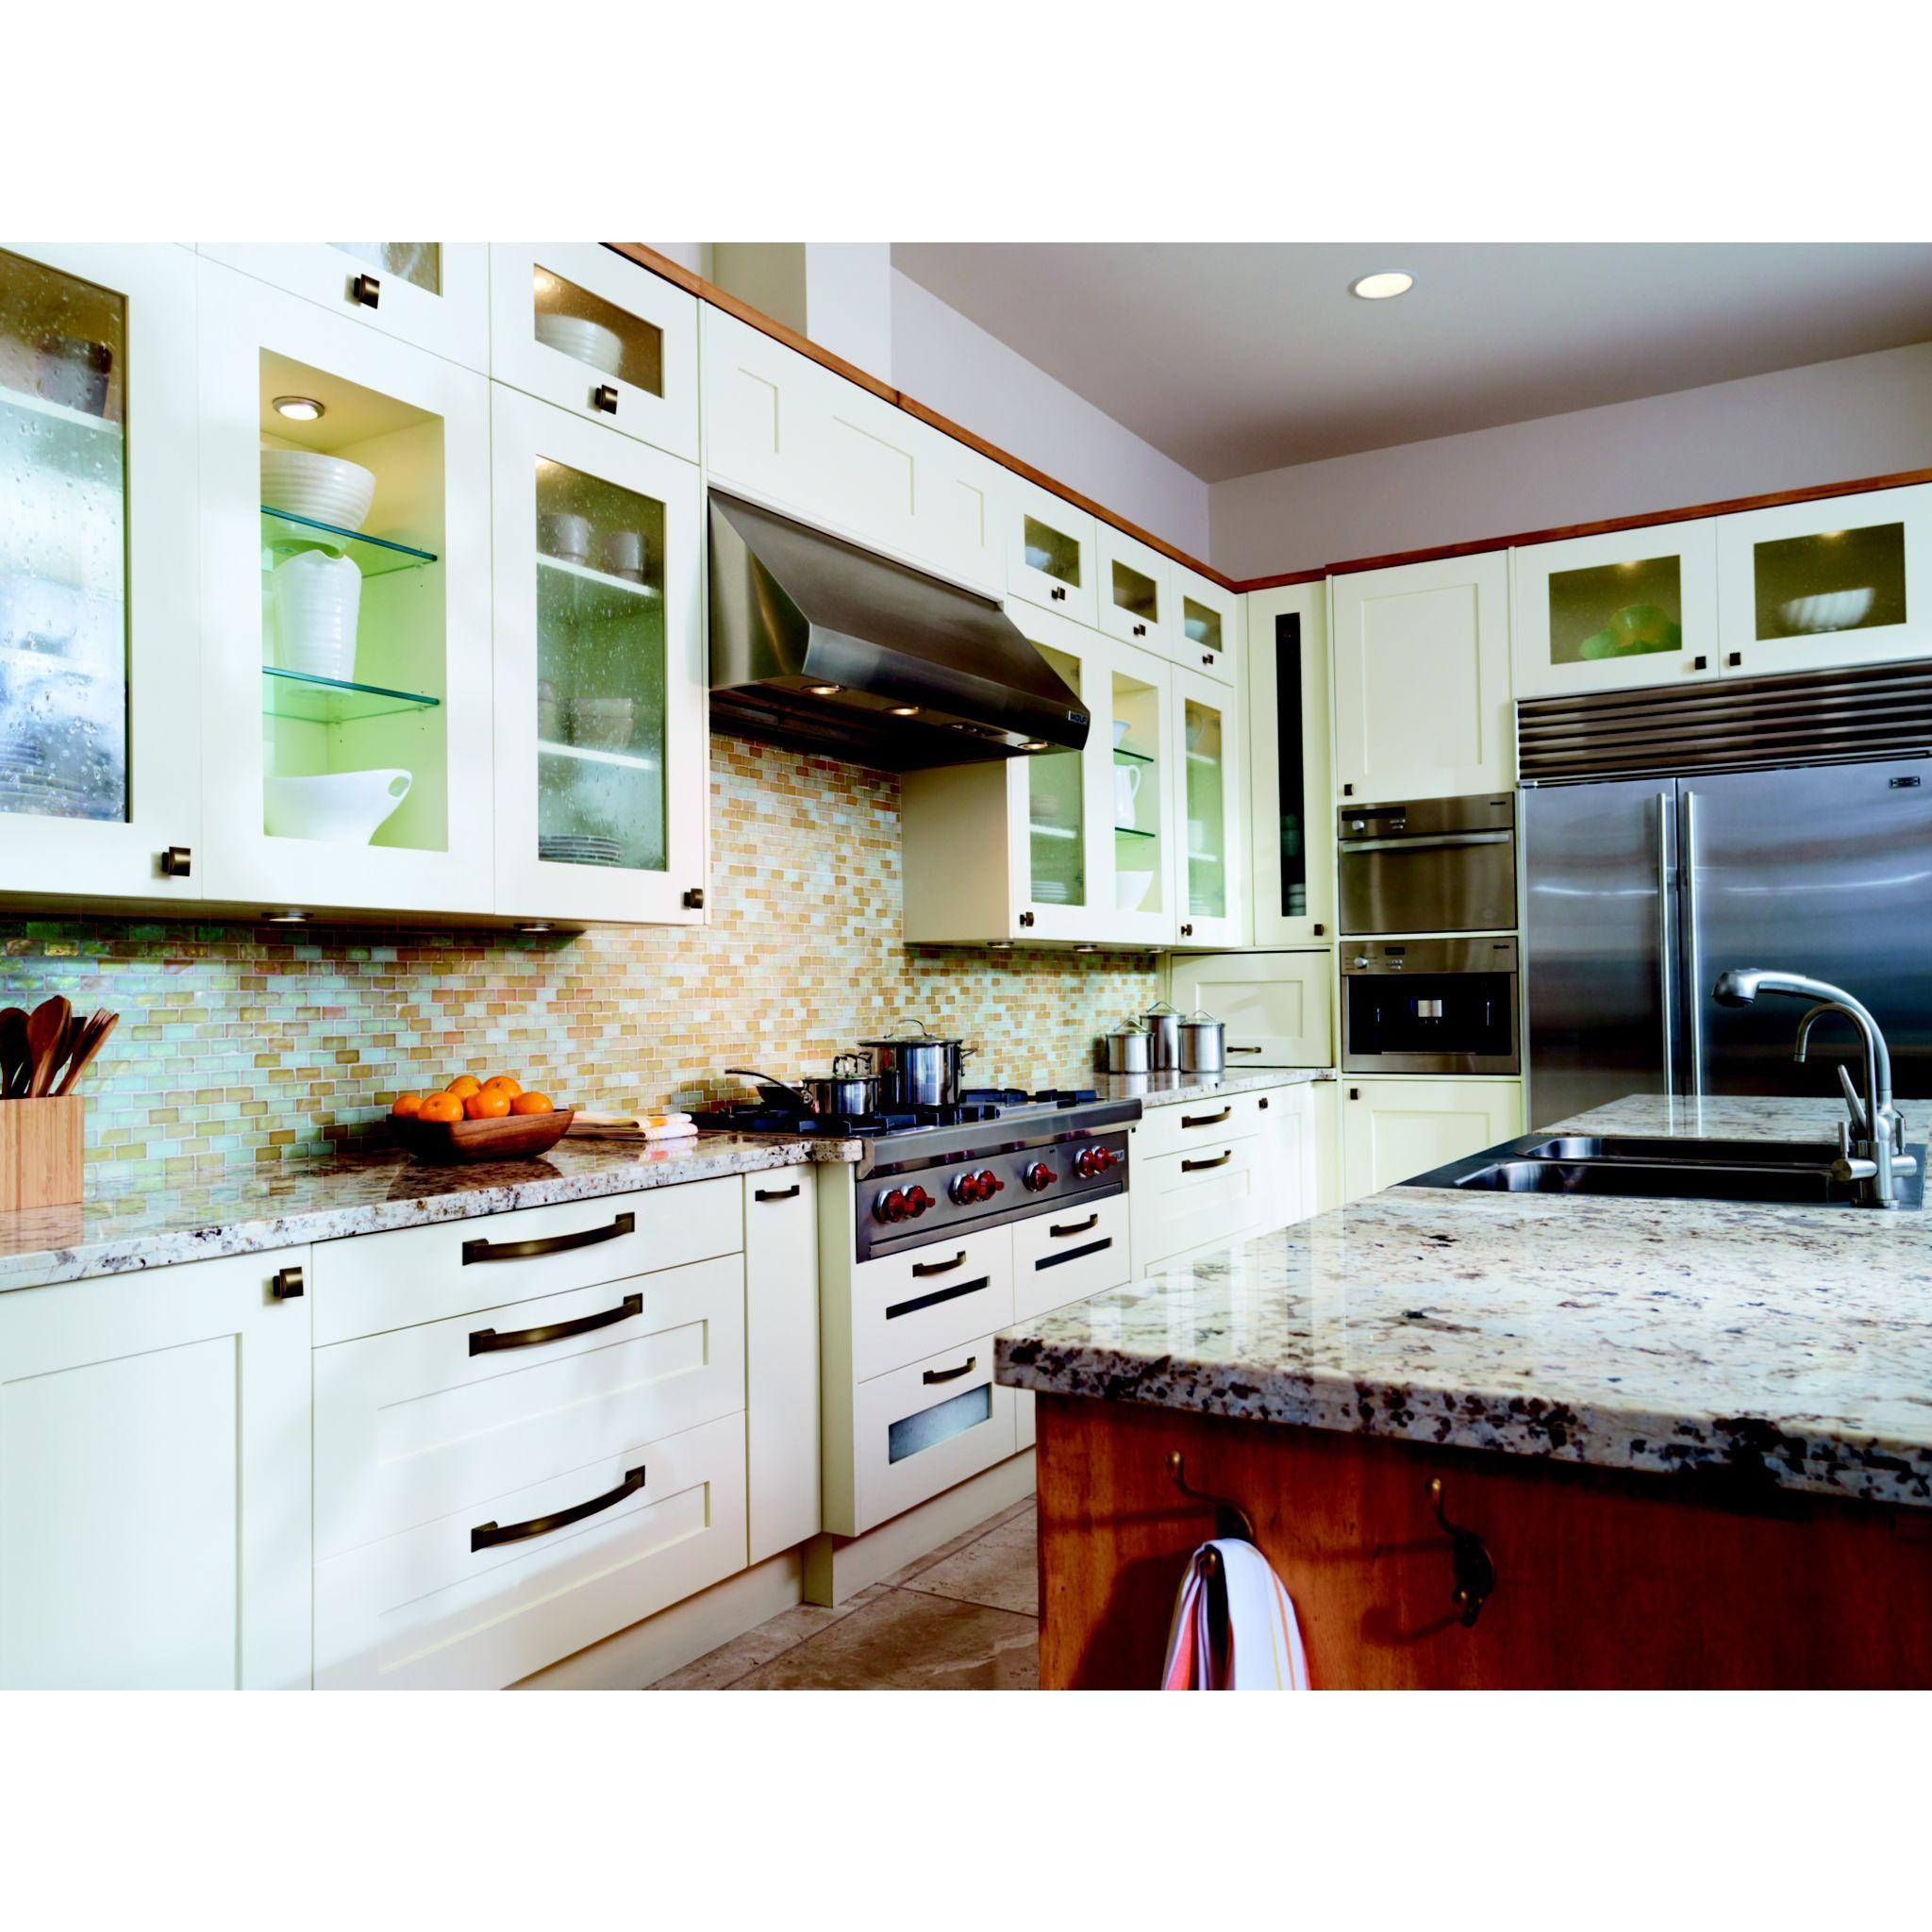 Decor Cabinets Hardware: Amerock Candler In Caramel Bronze Decorative Cabinet